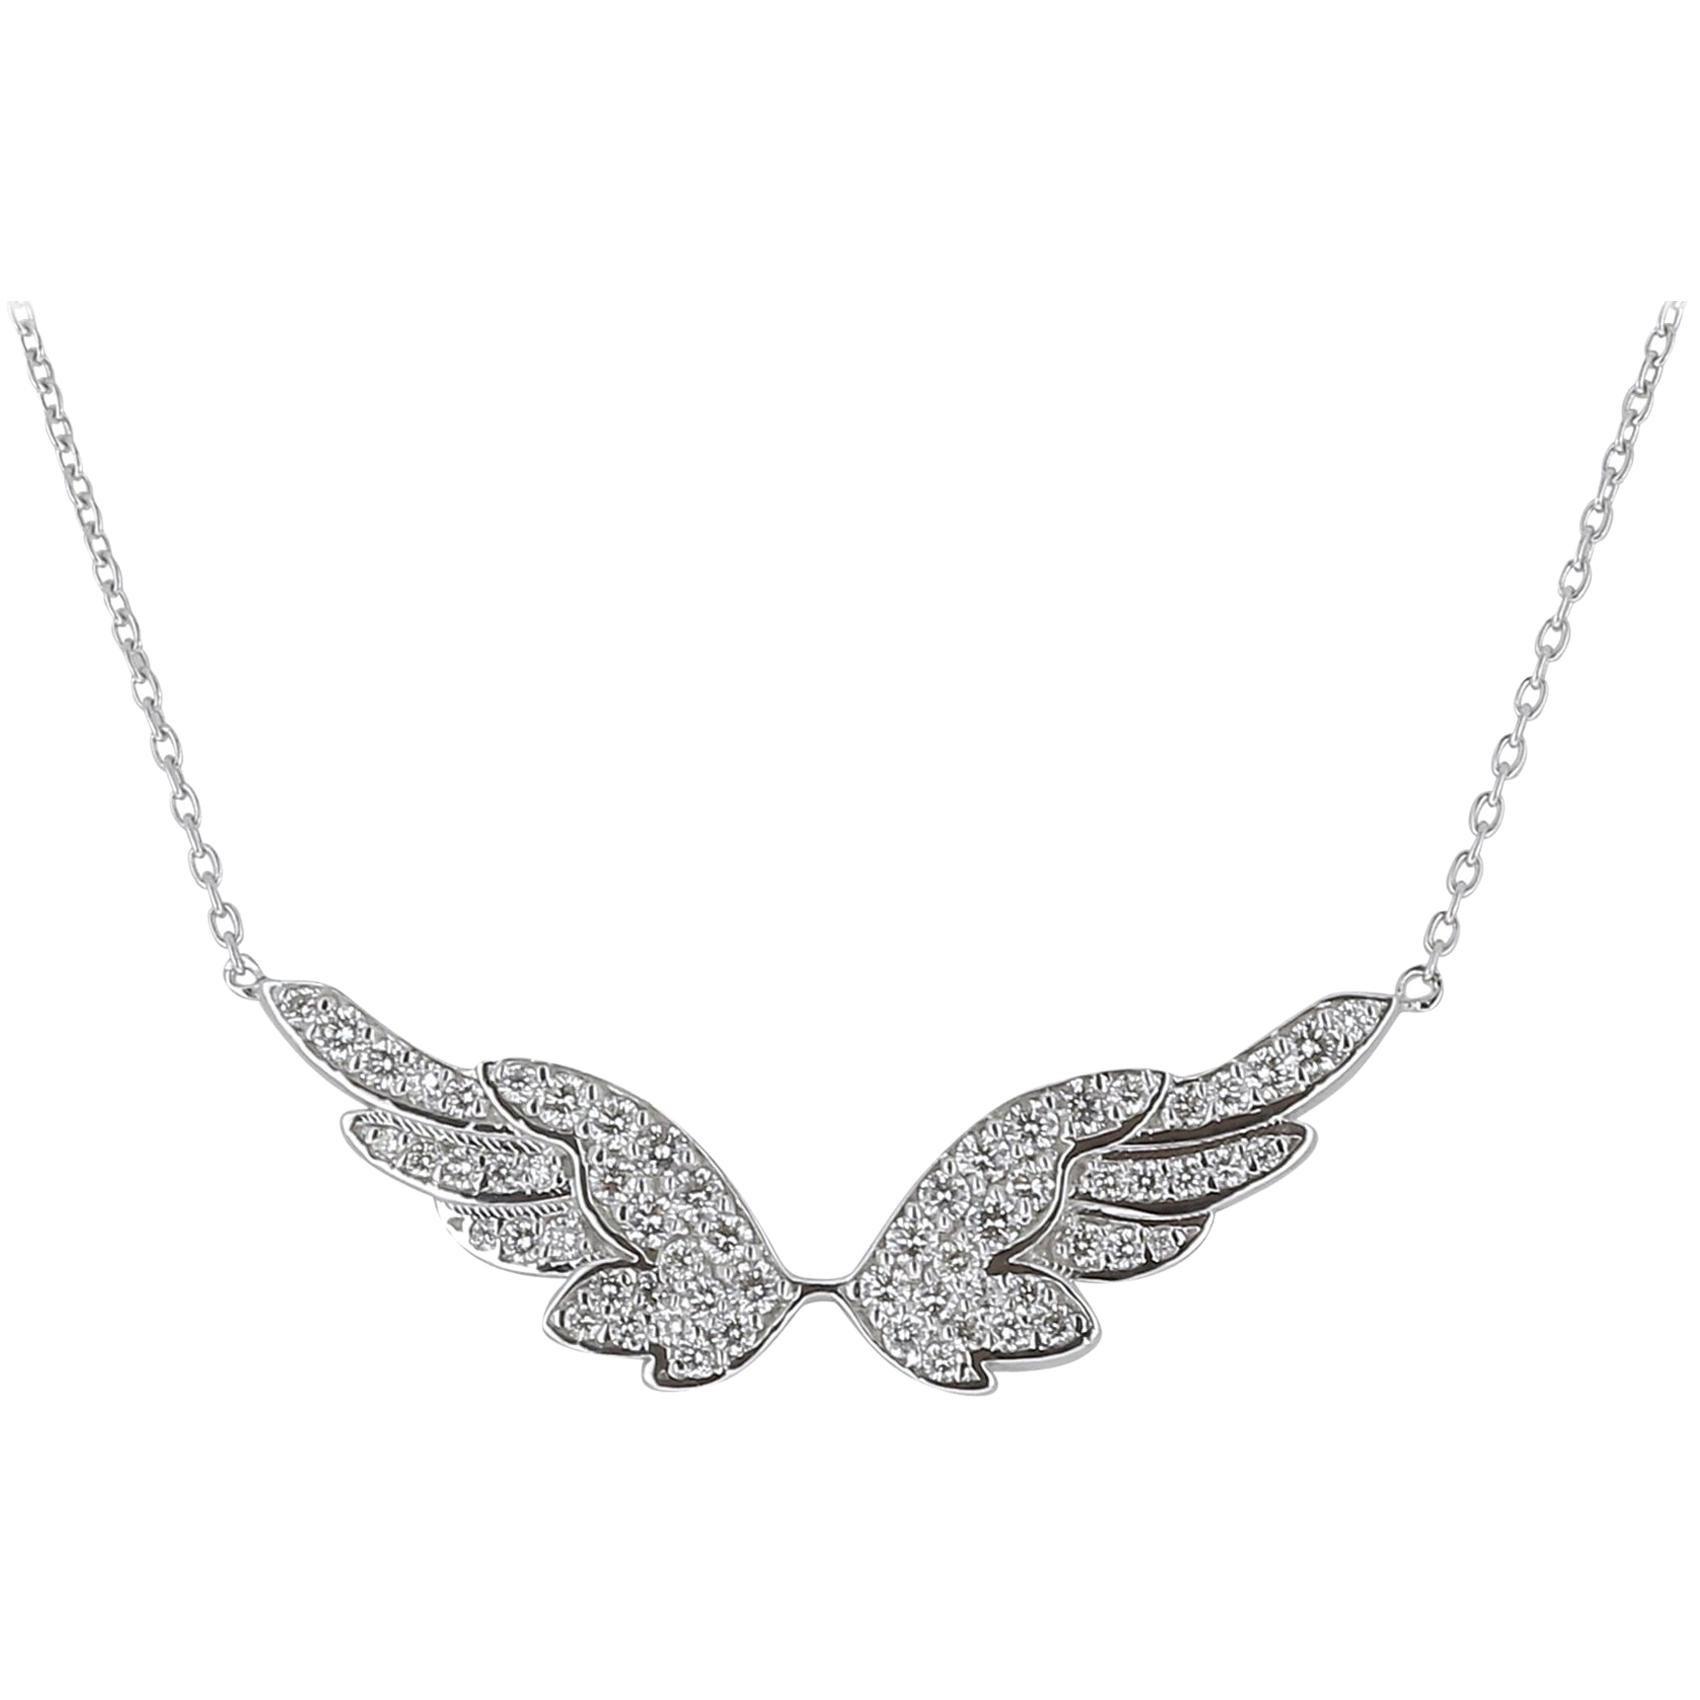 0.74 Carat GVS Round Diamond Angel Wings Chain Necklaces 18 Karat Gold/Pendant